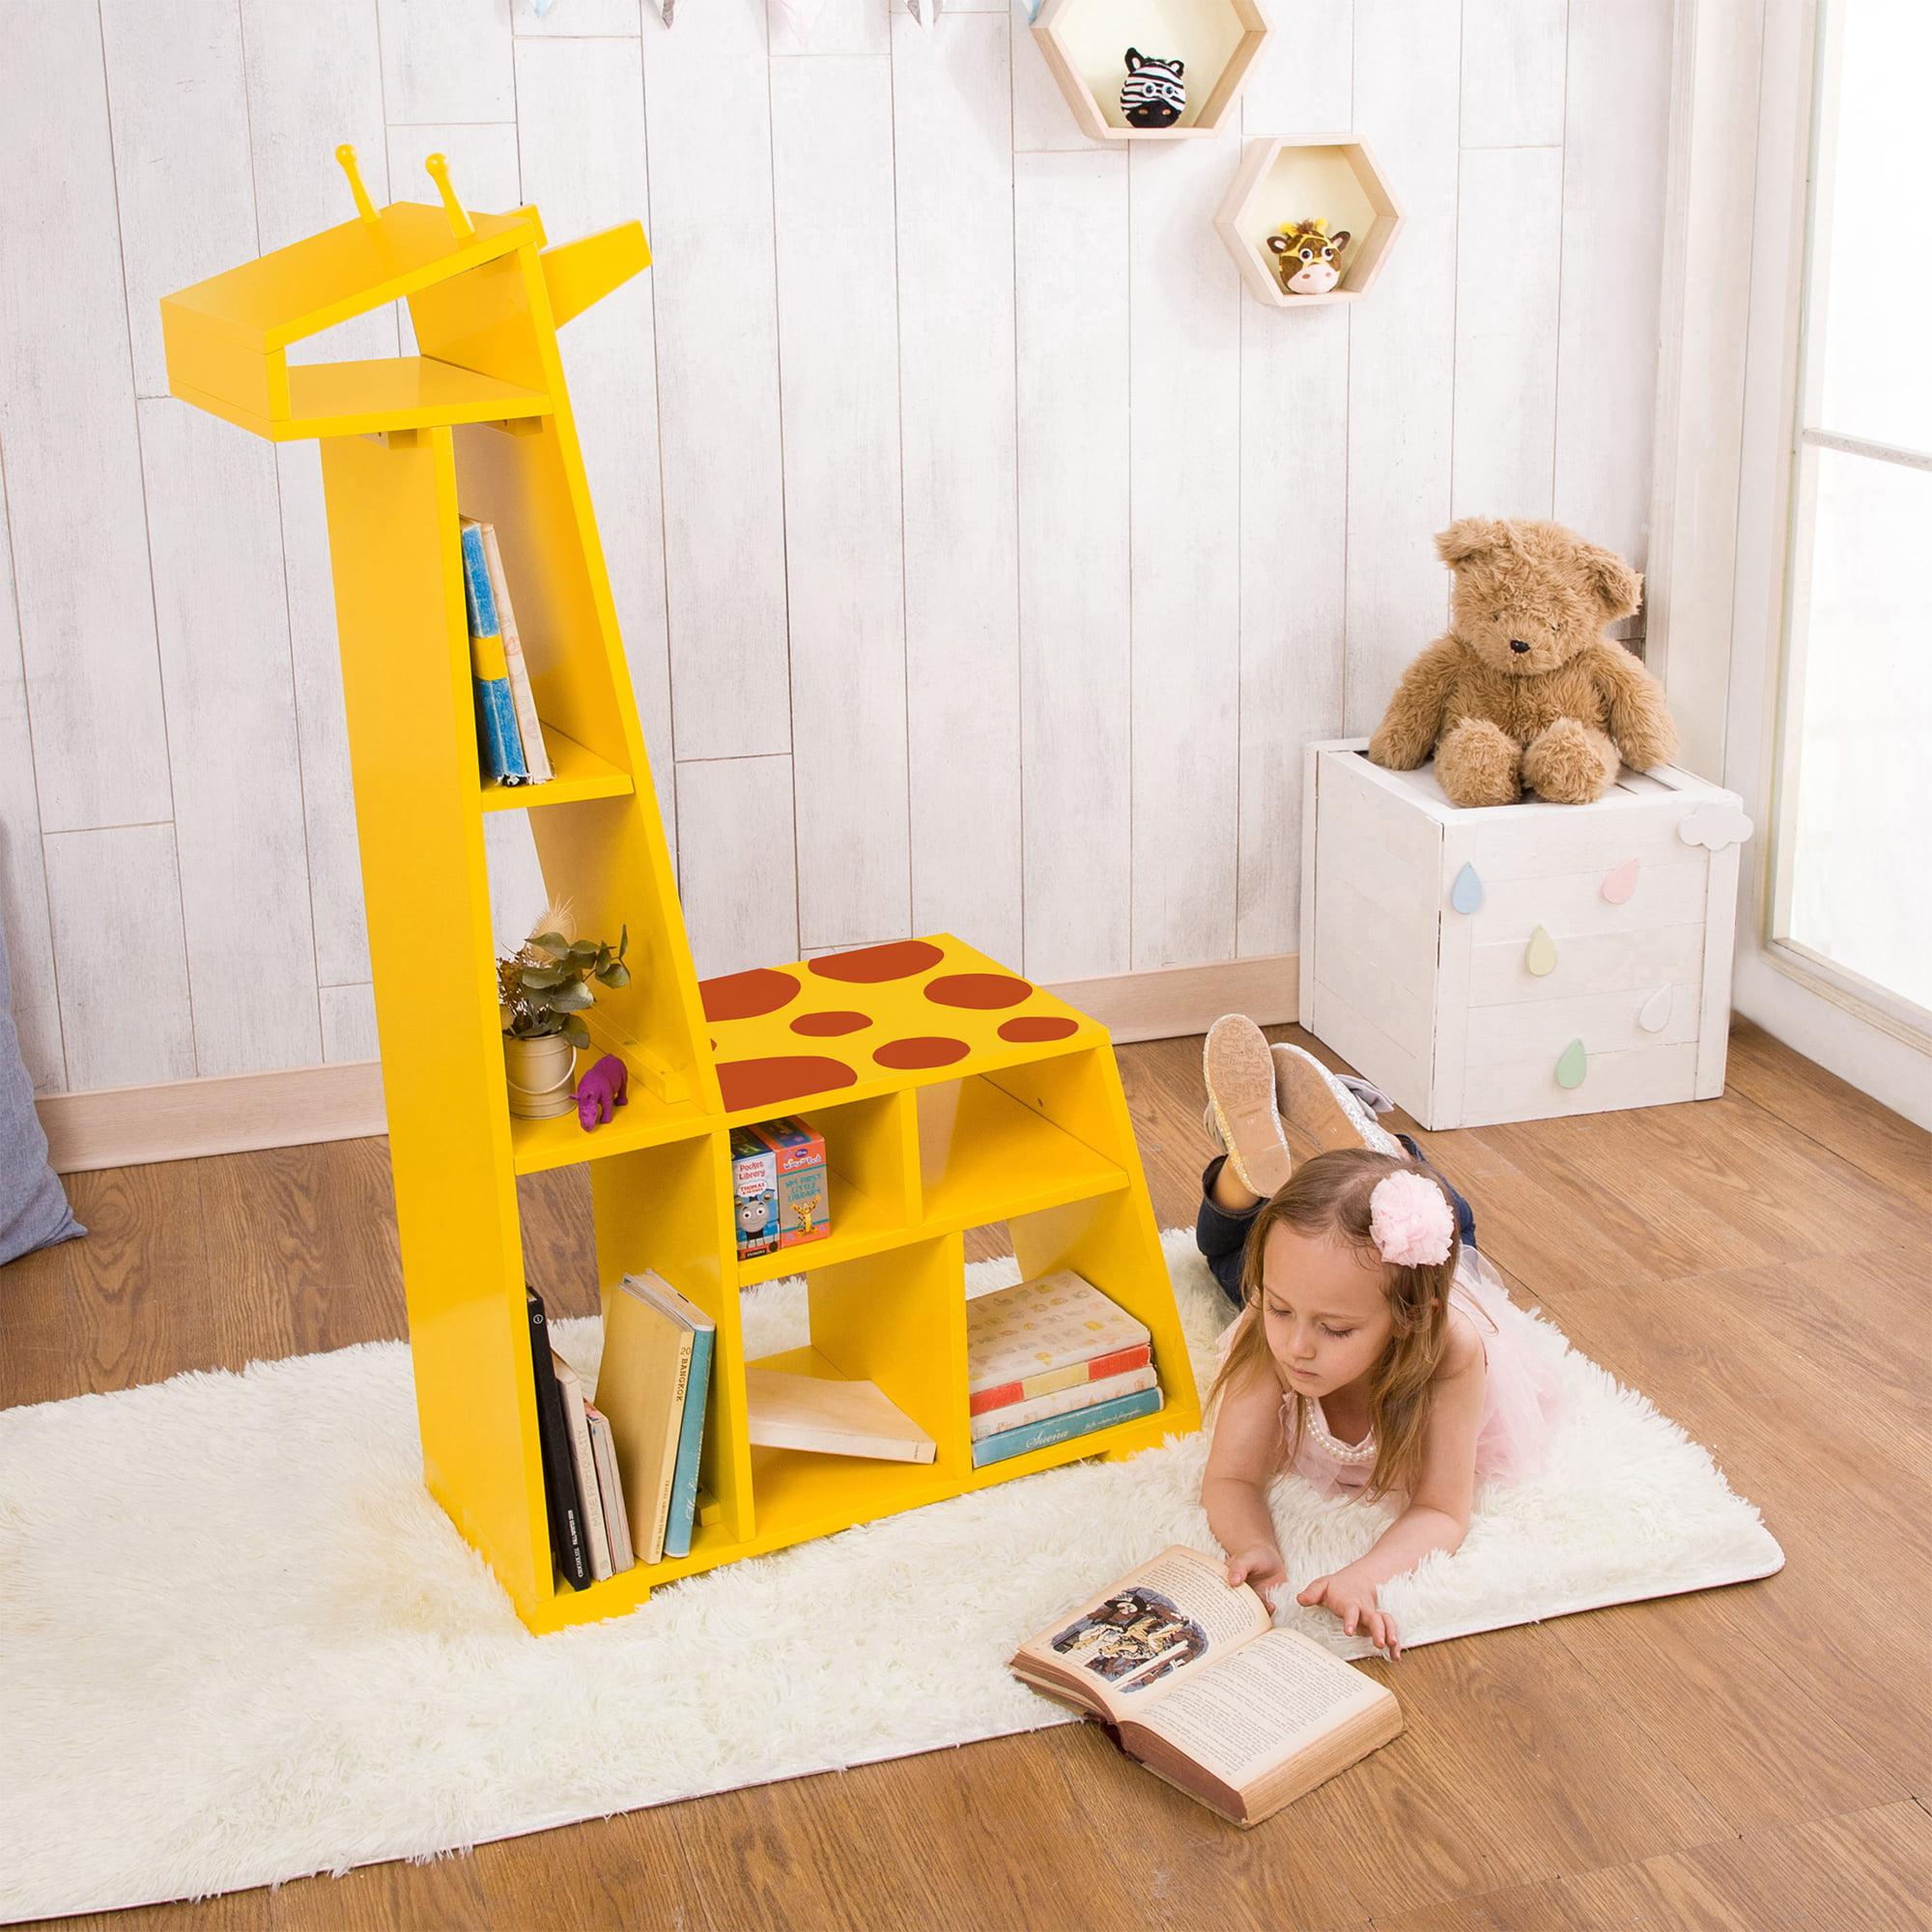 Teamson Kids Bookshelf, Zoo Kingdom Giraffe, Yellow and Orange